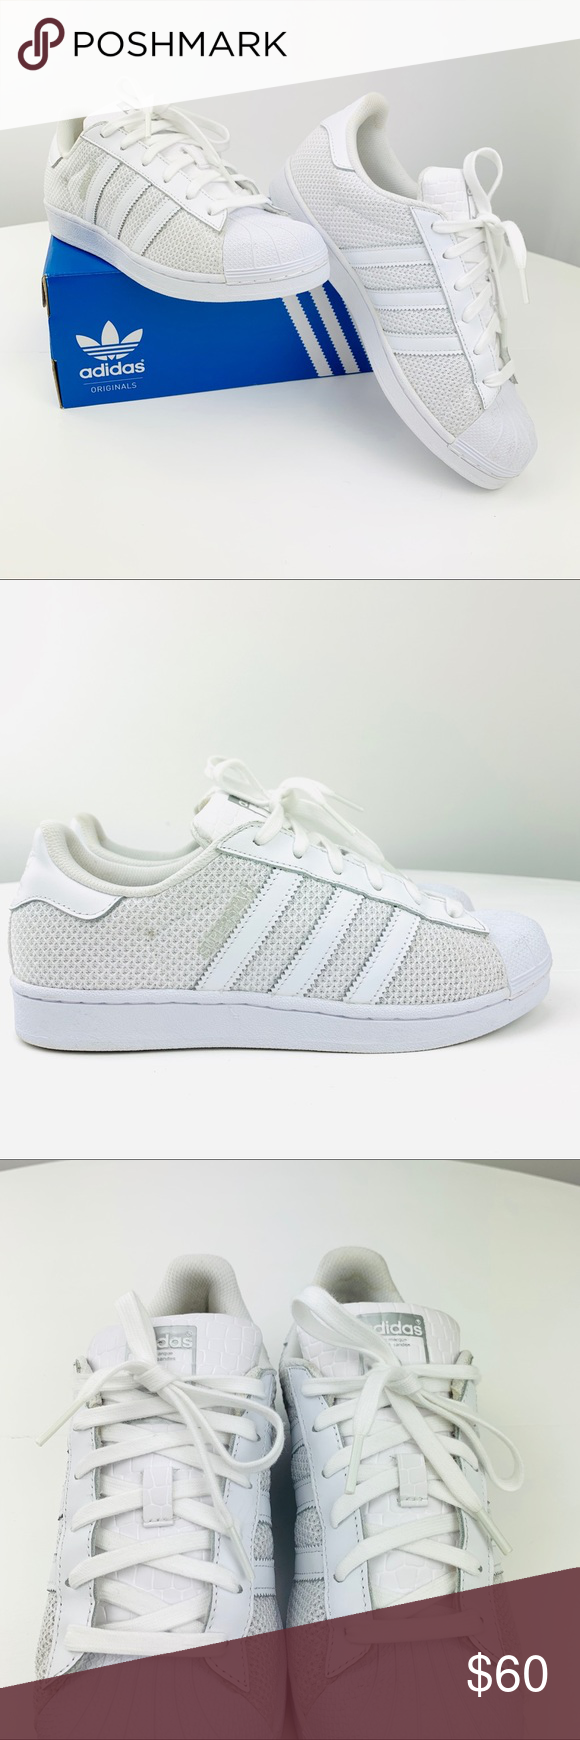 0dec1f448e Adidas Superstar Running Shoes Adidas Superstar Running Shoes •Size  7.5  women  6.5 Men